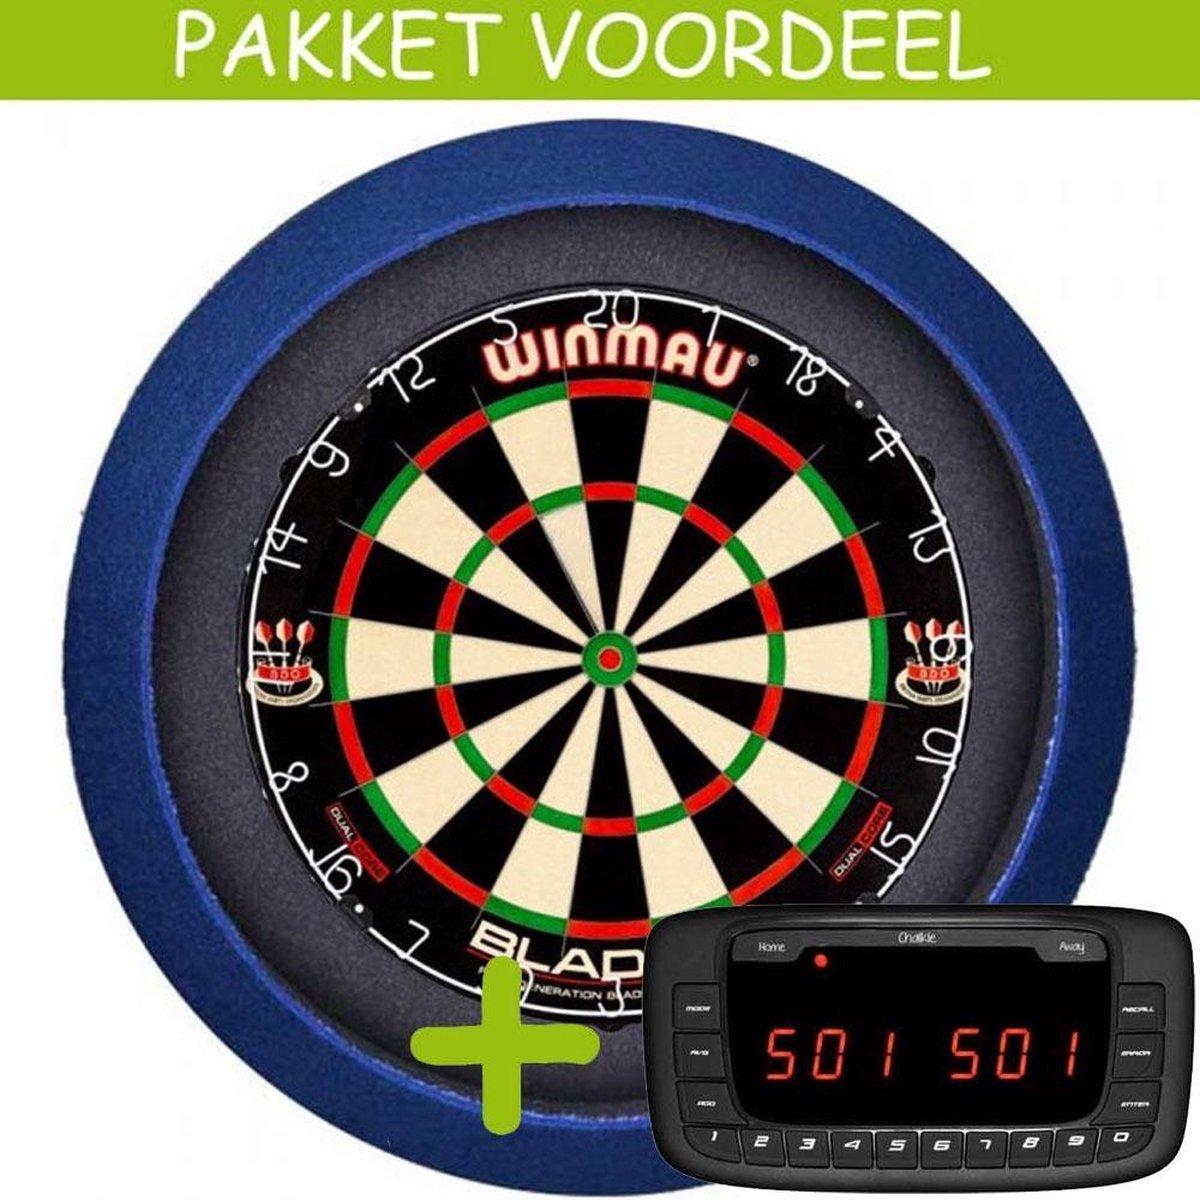 Elektronisch Dart Scorebord VoordeelPakket (Chalkie ) - Dual Core - Dartbordverlichting Basic (Blauw)